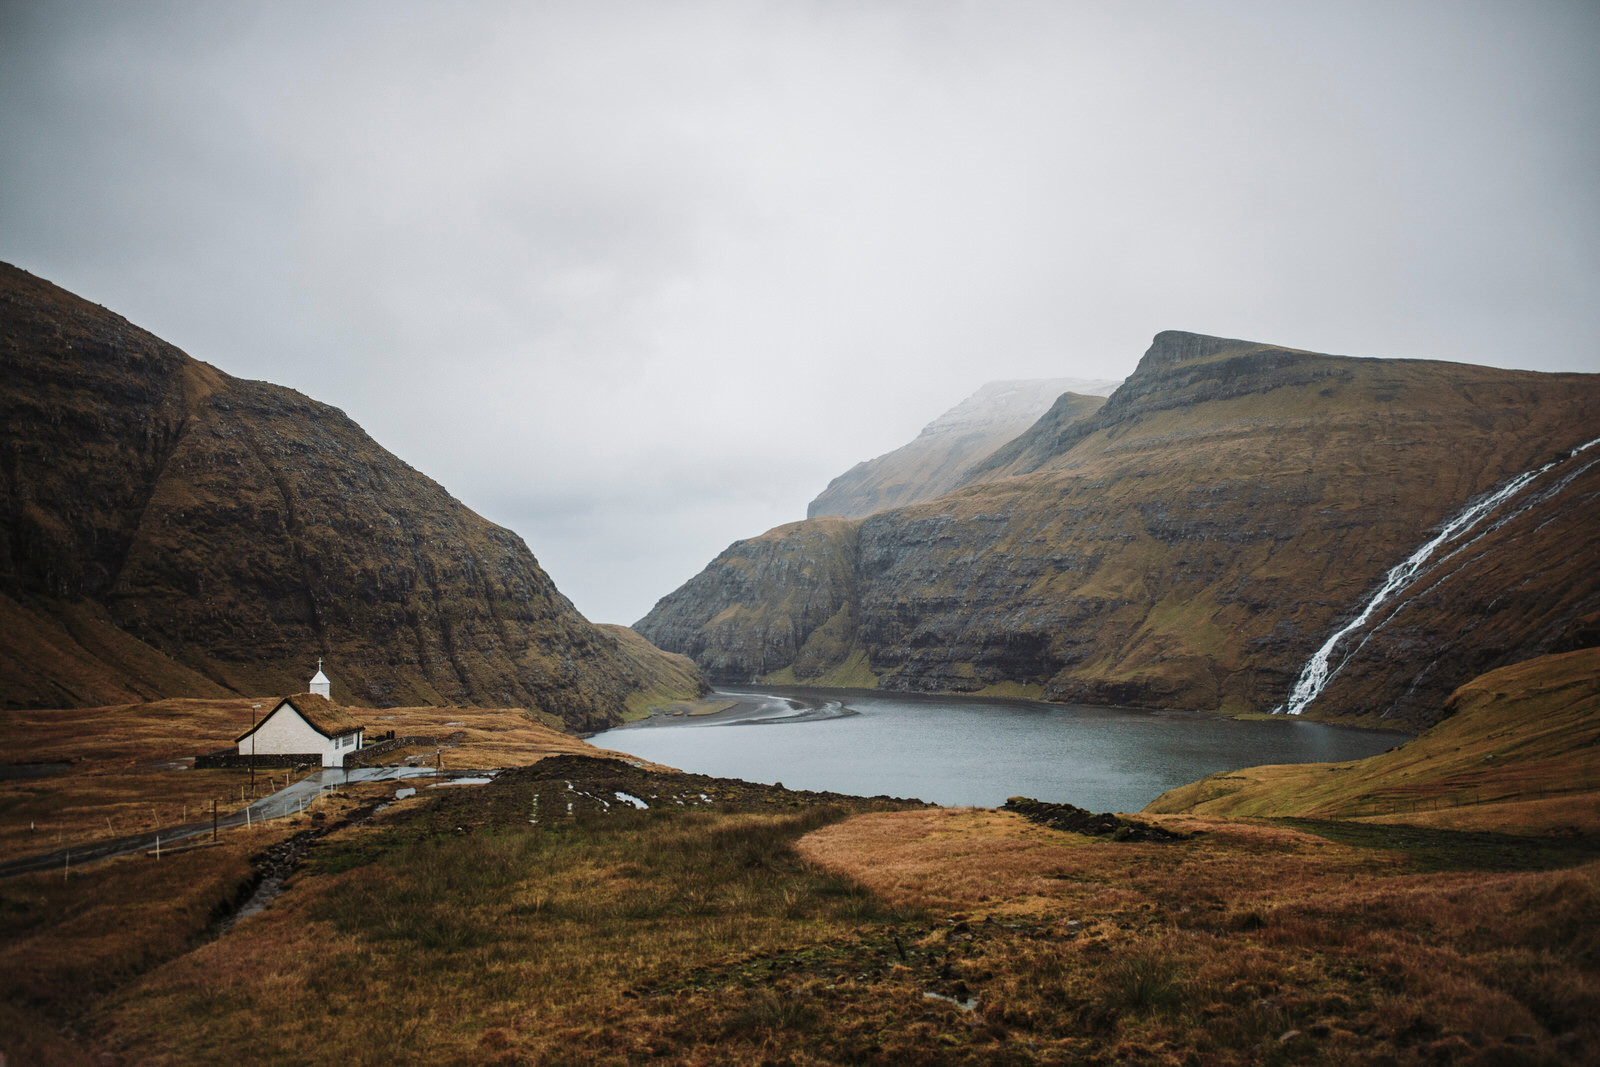 viaggio isole faroe_43.jpg